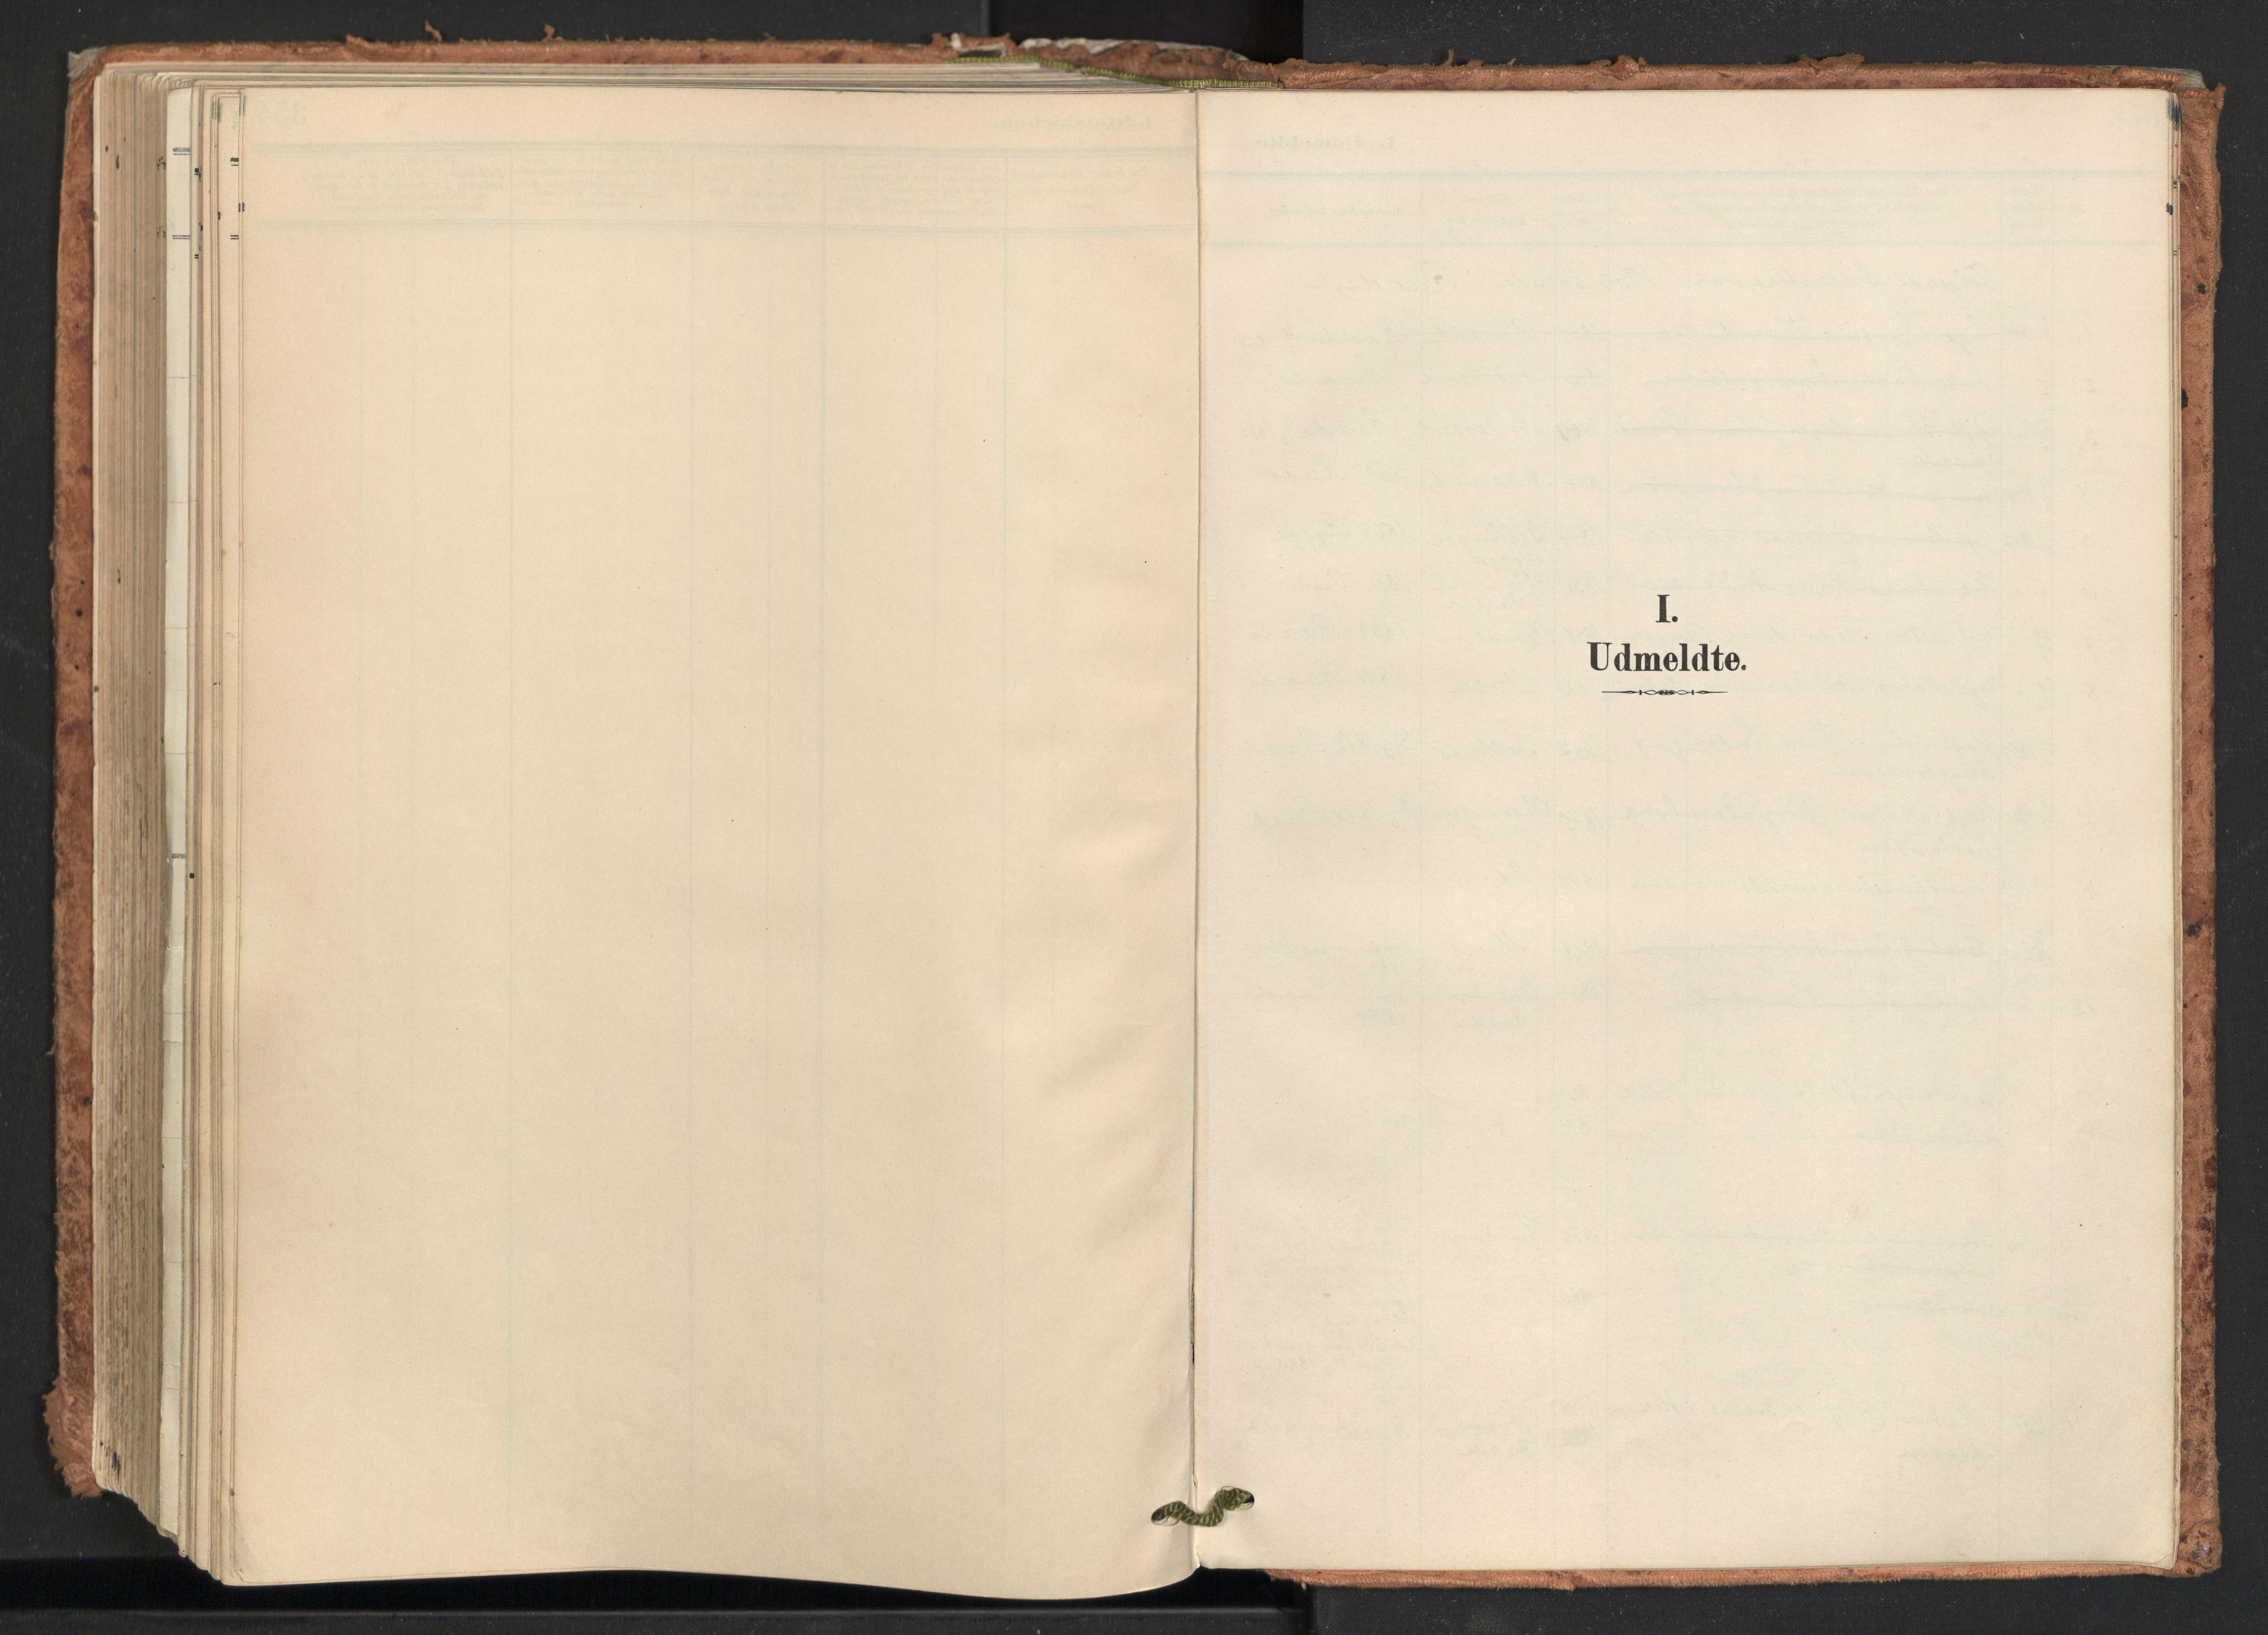 SAO, Råde prestekontor kirkebøker, F/Fa/L0008: Ministerialbok nr. 8, 1903-1924